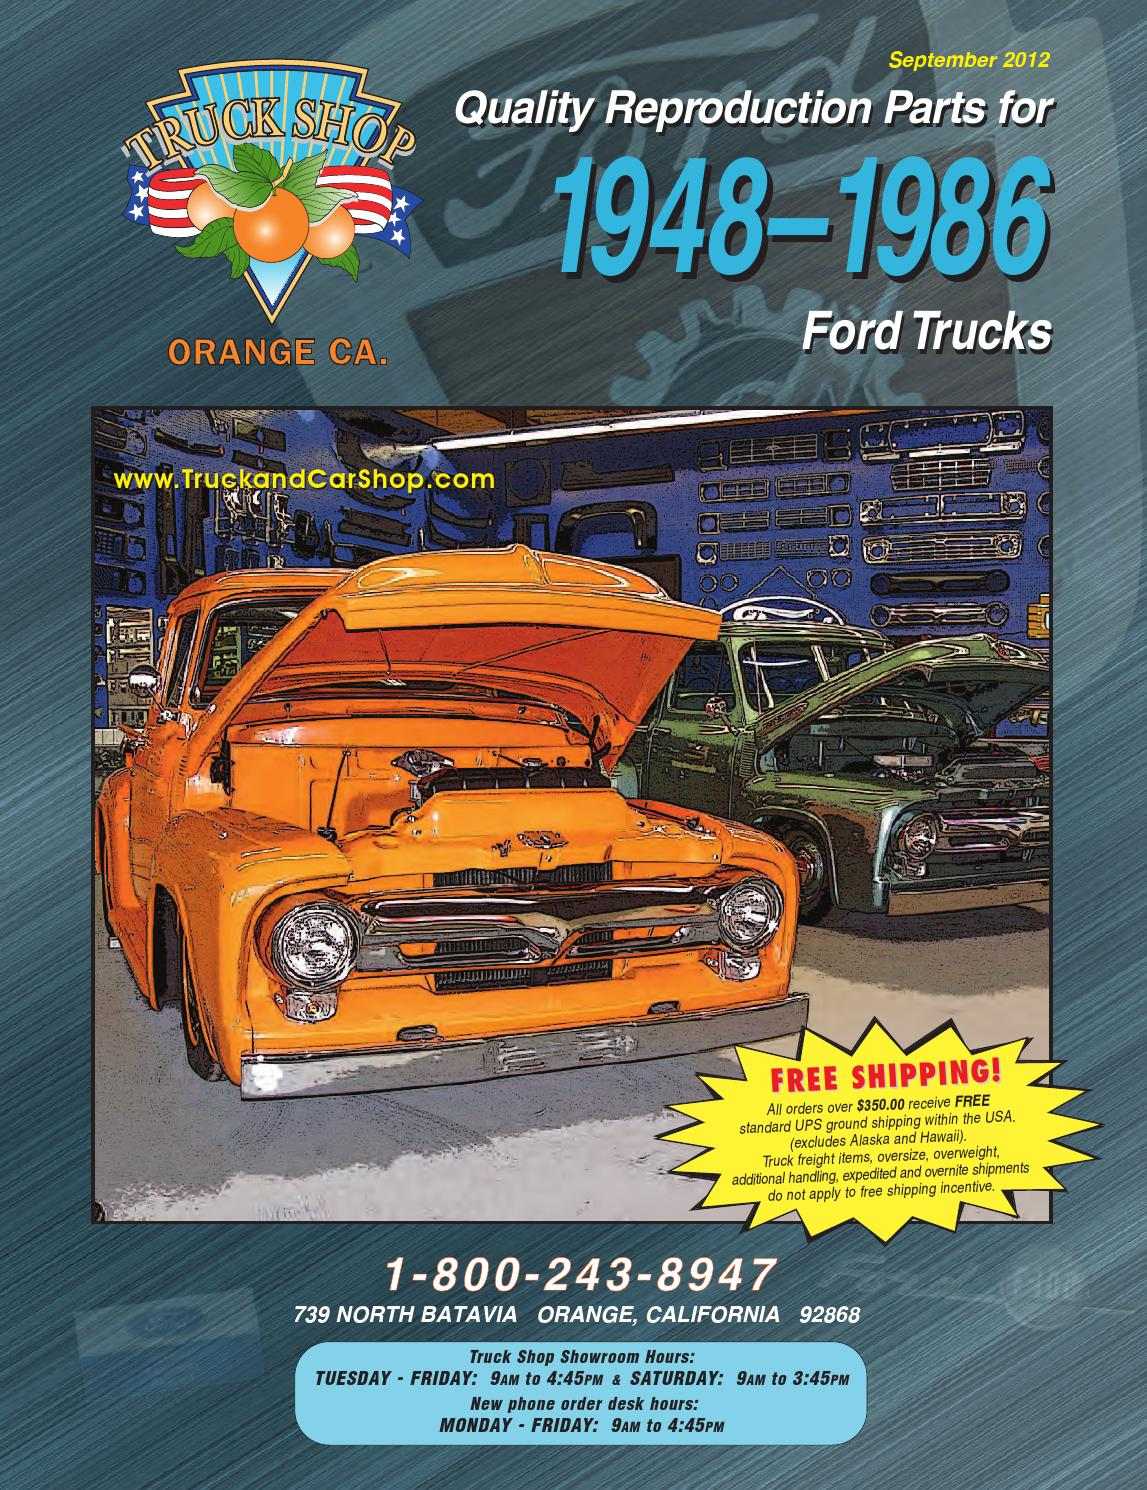 Chevrolet Cruze Repair Manual: Body Lock Pillar Outer Panel Reinforcement Replacement (MAG-Welding)